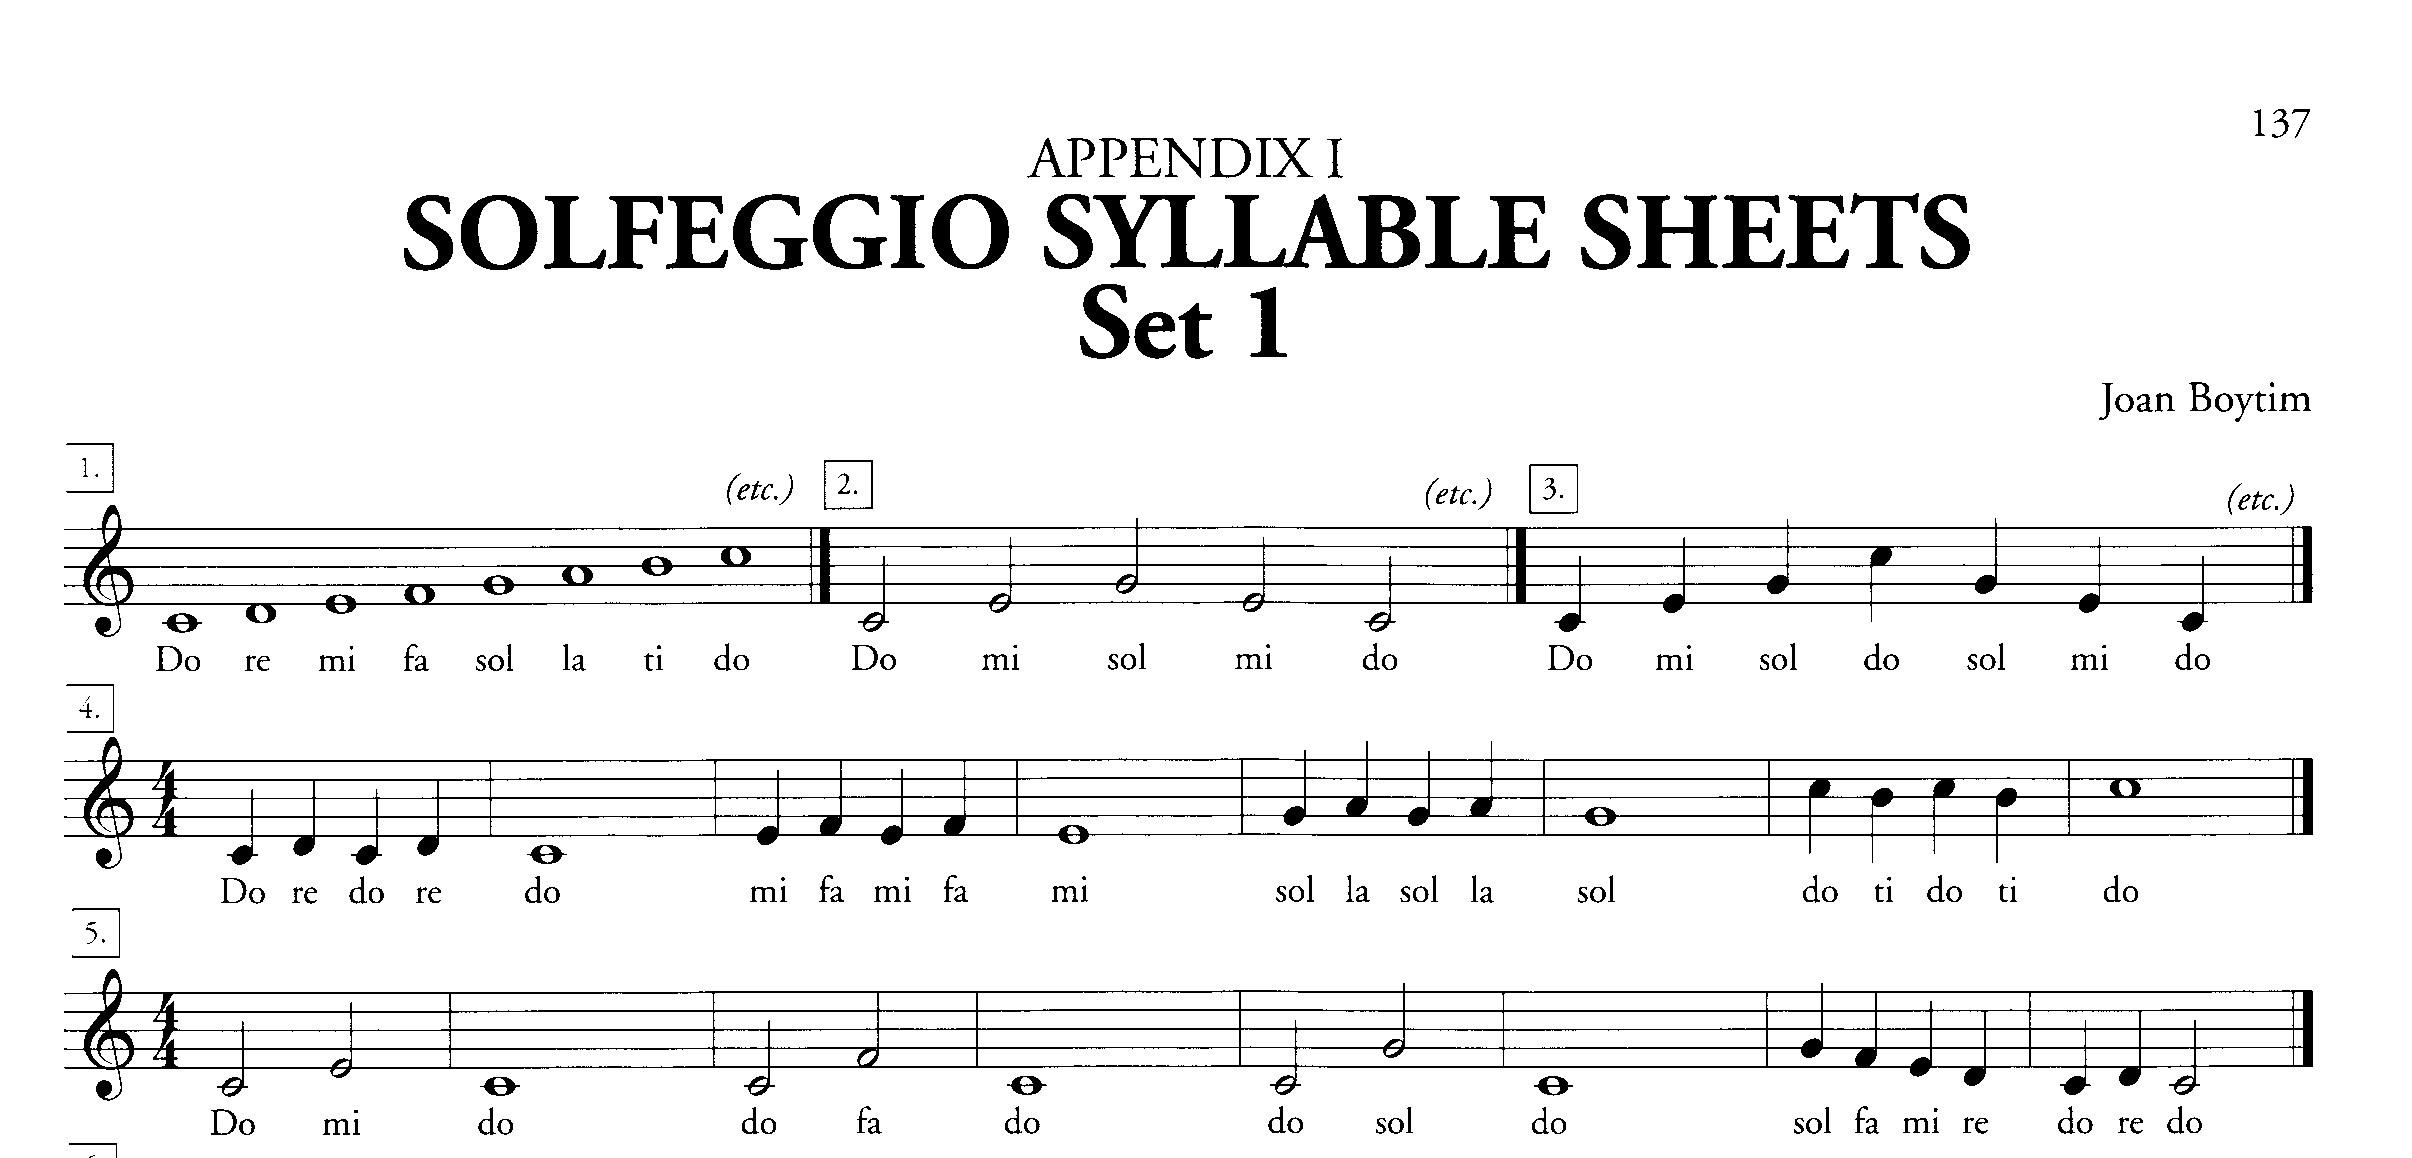 Boytim Solfeggio Syllable Sheet Set 1 Sample